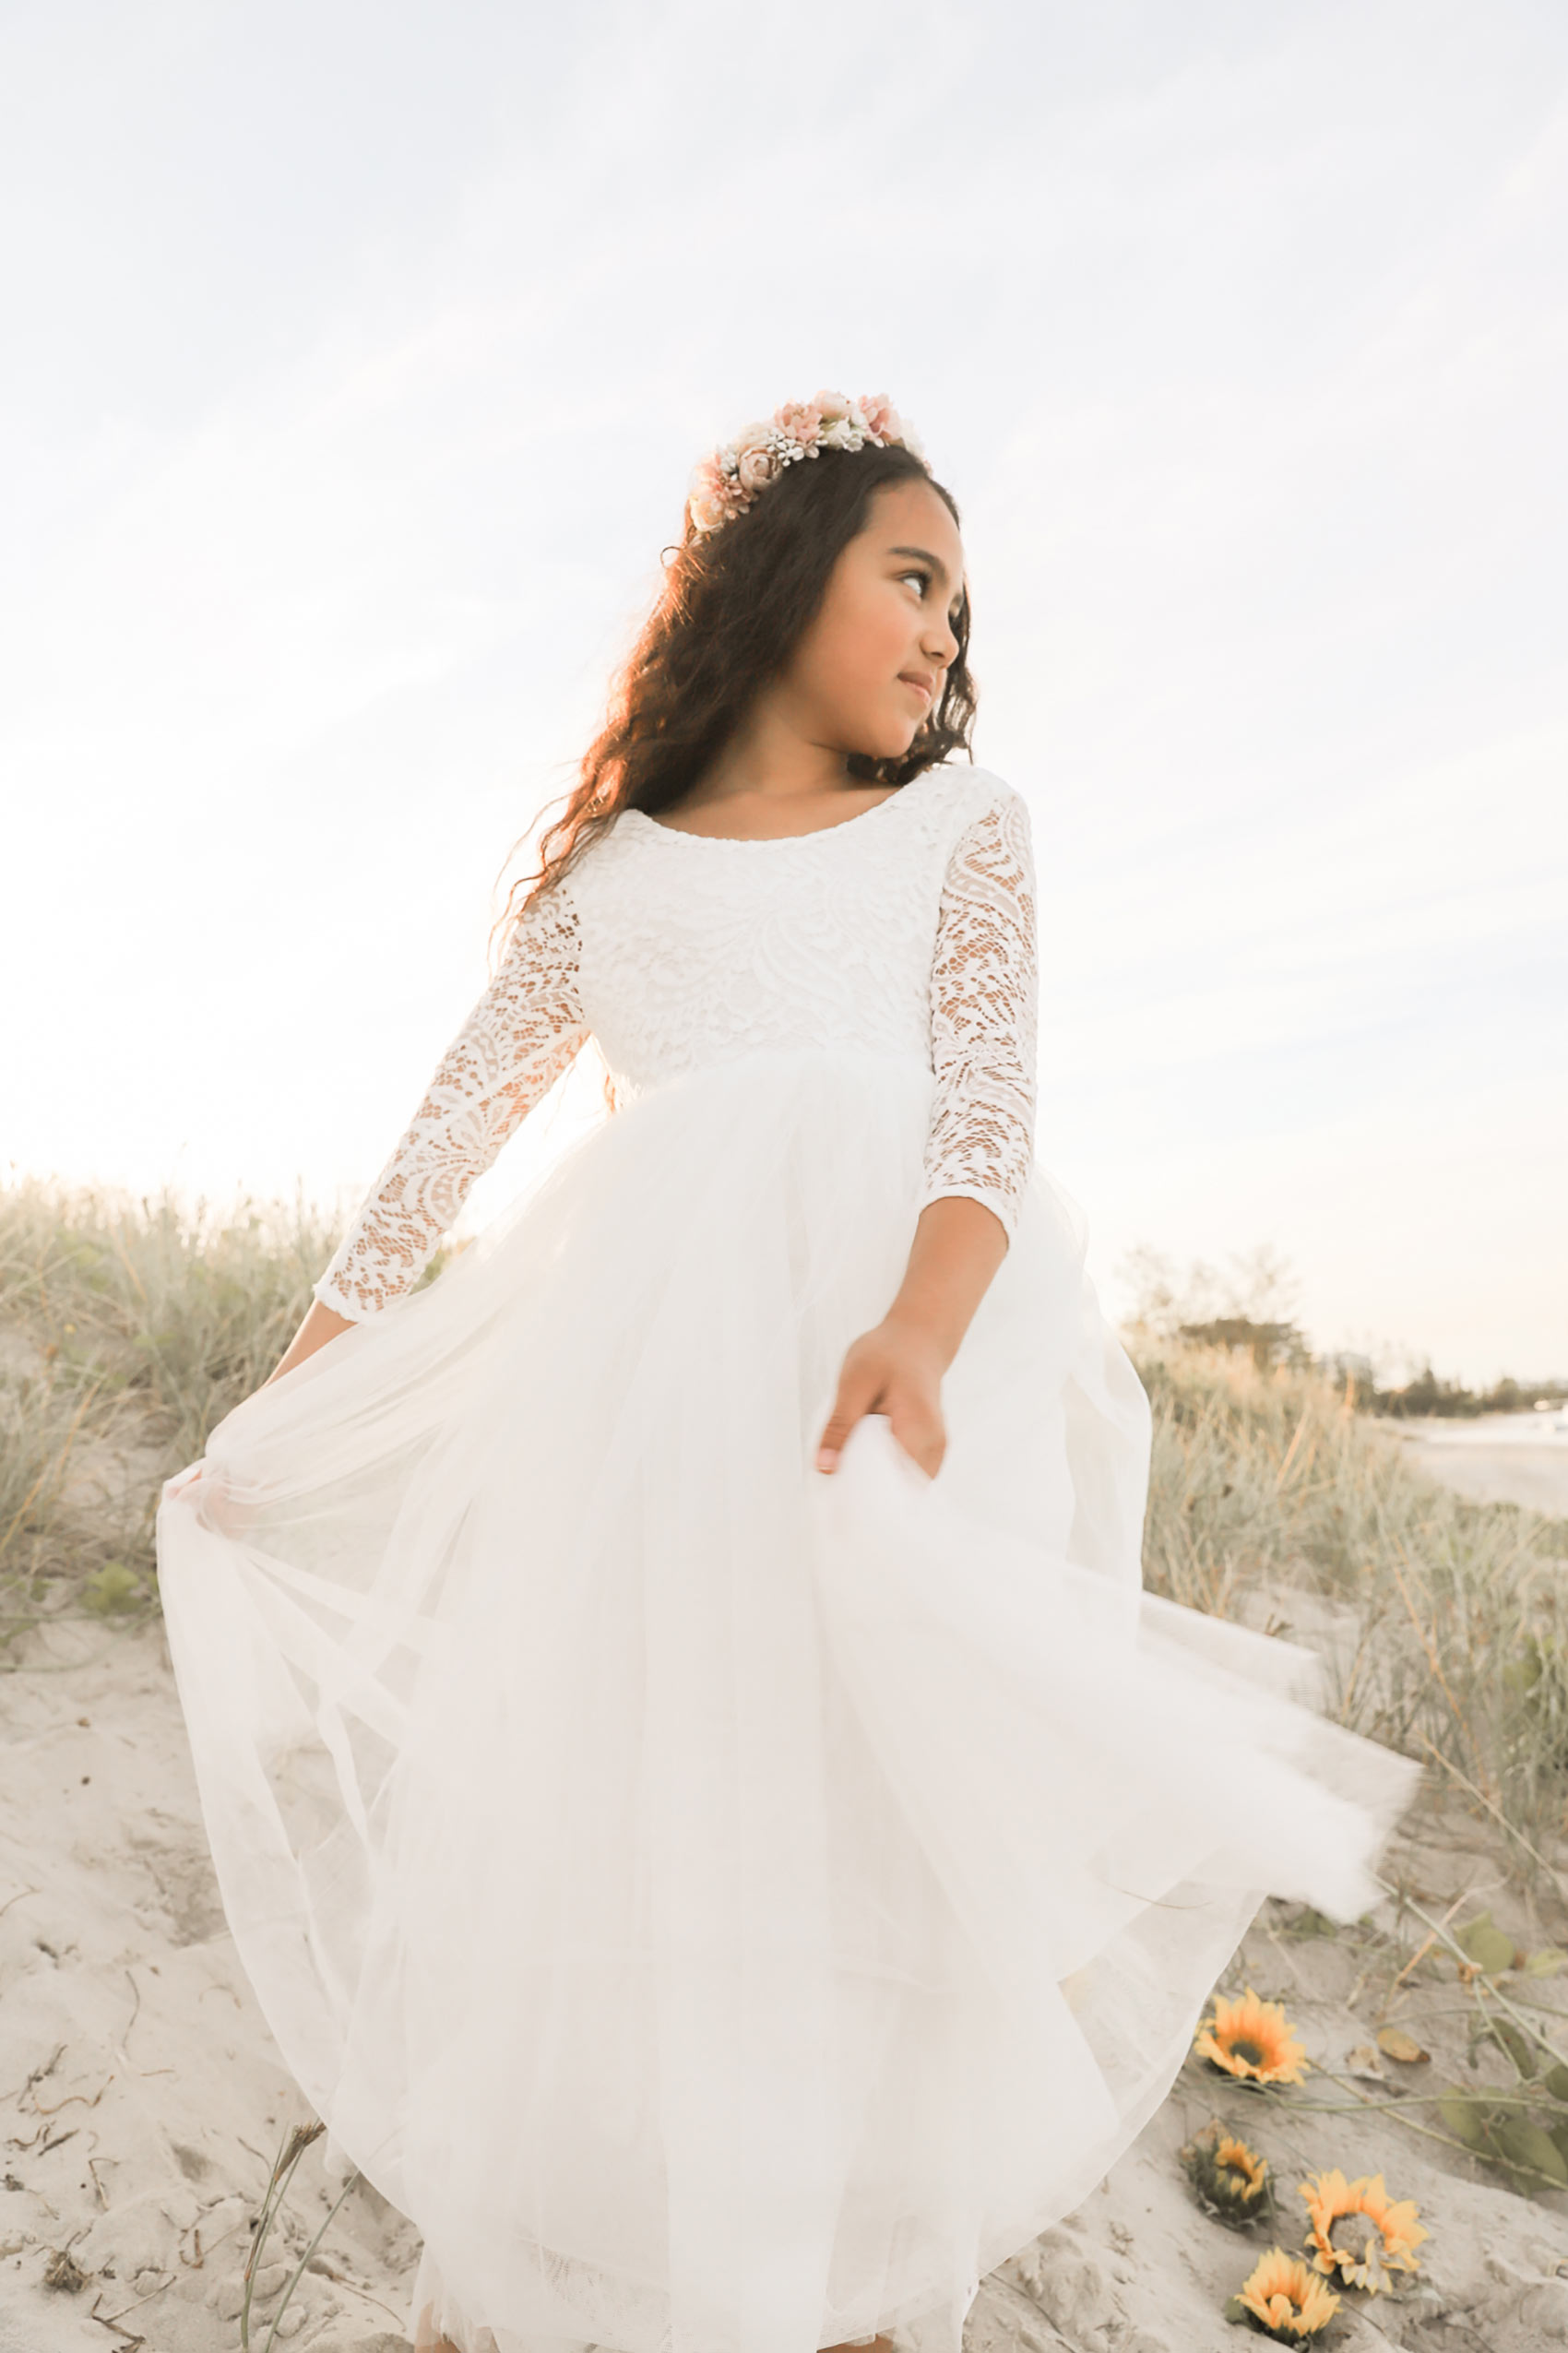 White Swan Dress Margot Crown